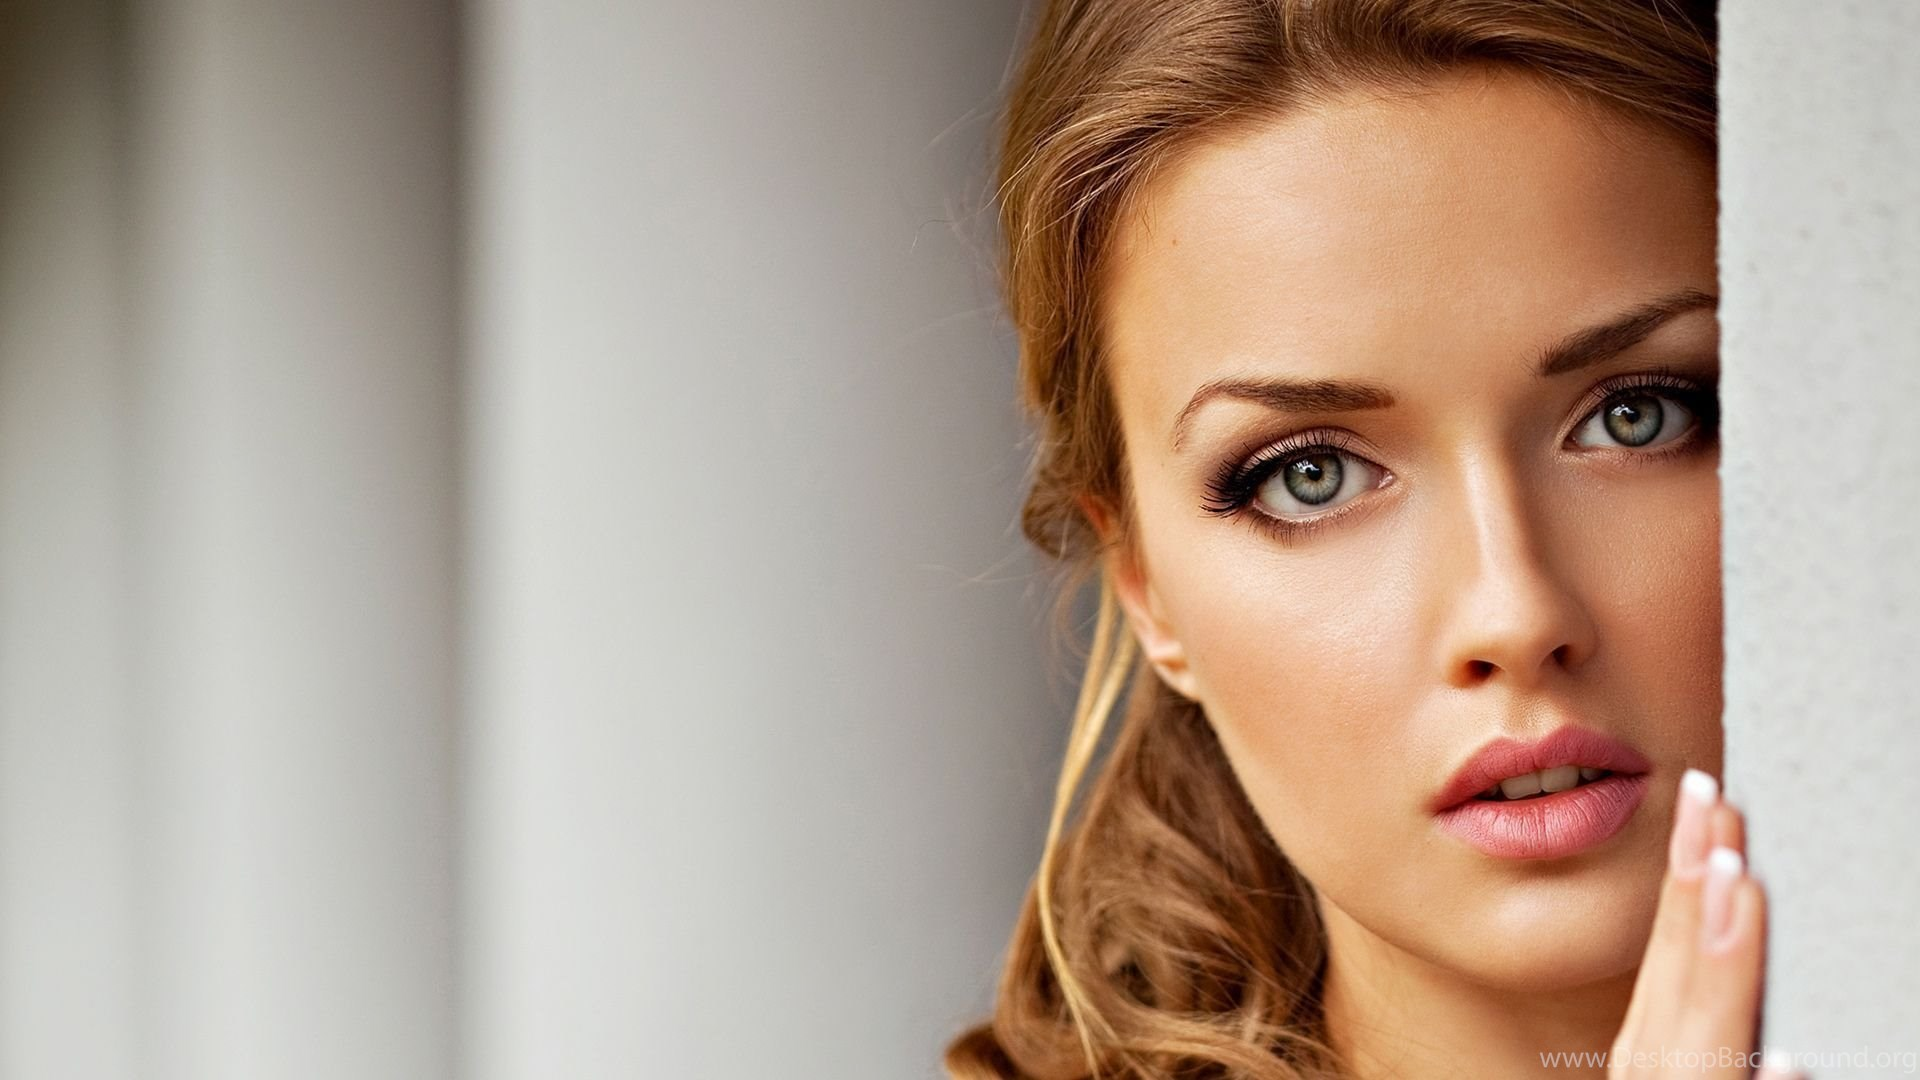 free download beautiful girl face hd desktop wallpapers  desktop